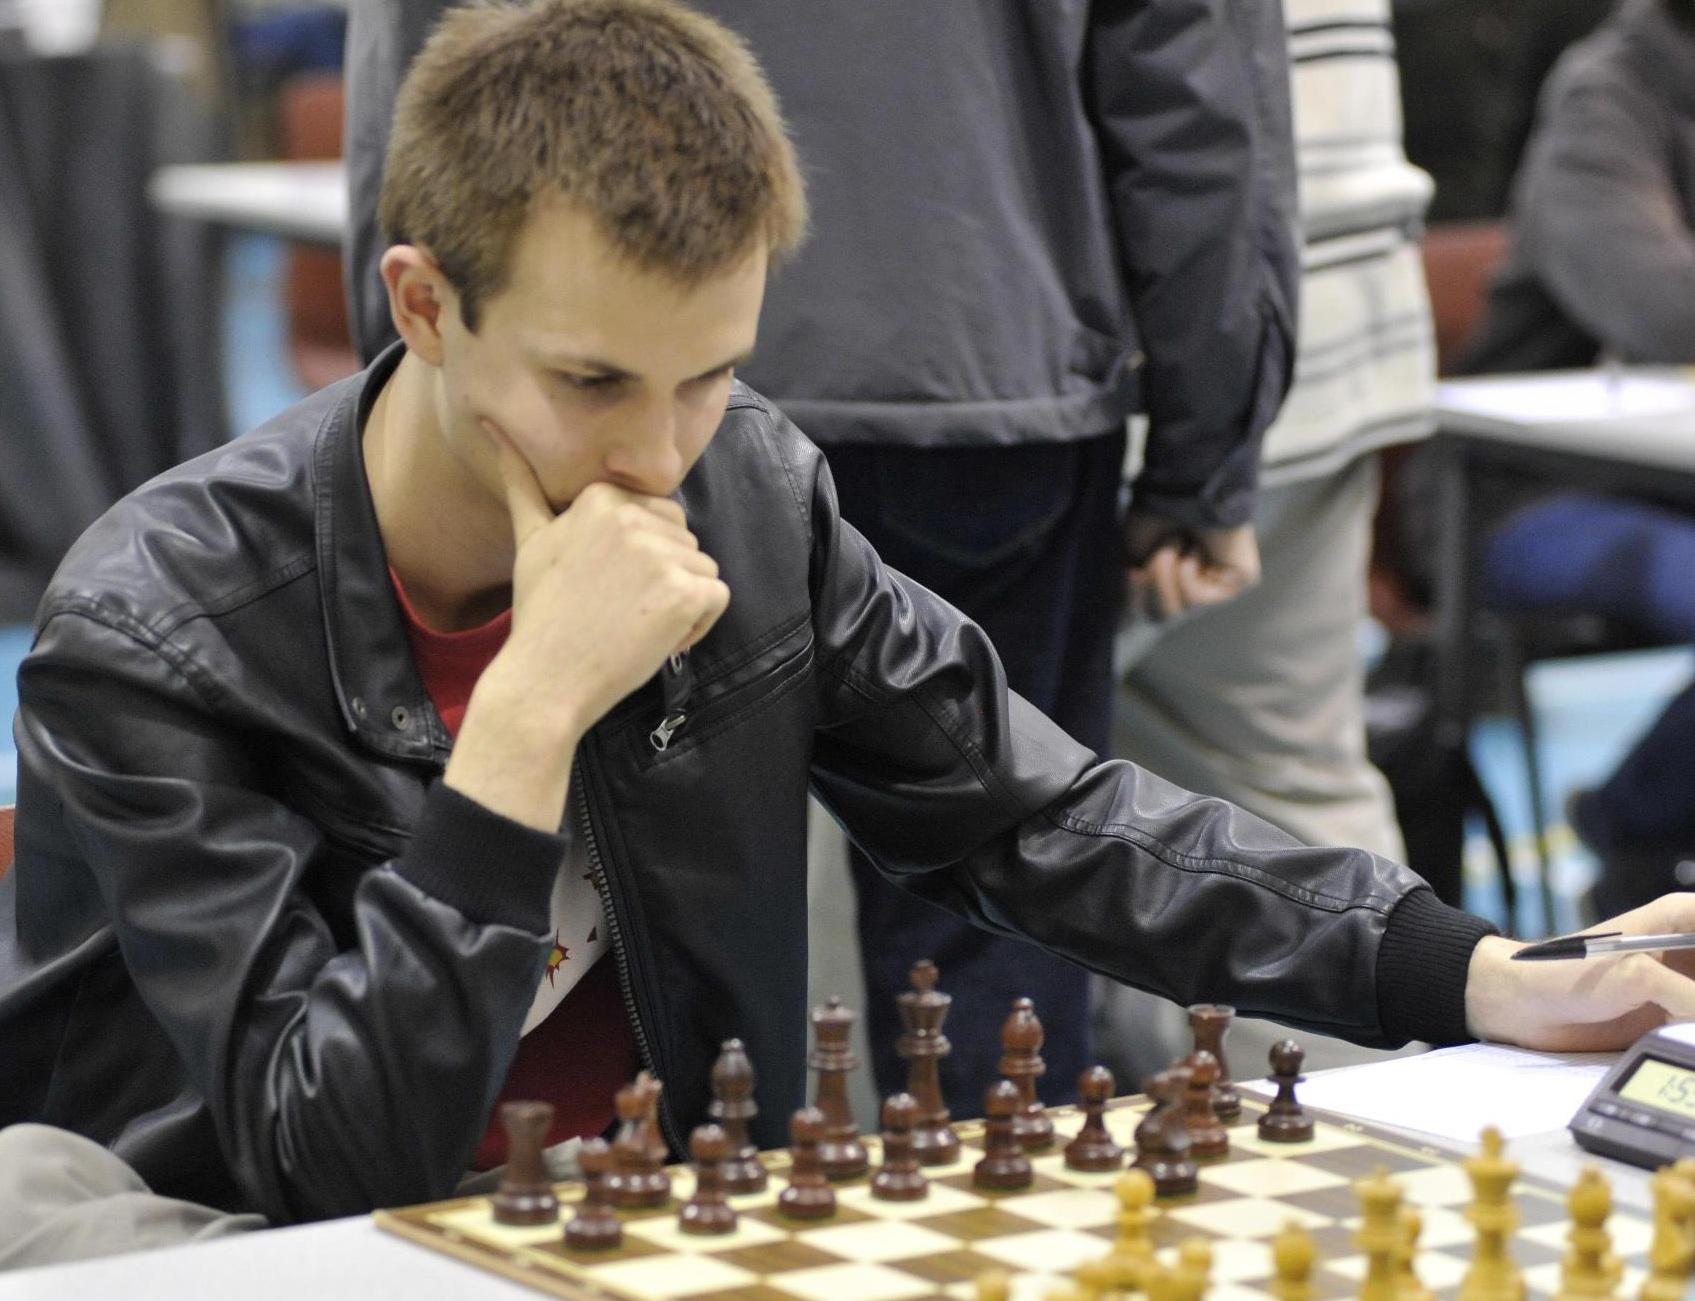 File:Peter Lalic playing chess, Surrey Congress, 2012.jpg ...